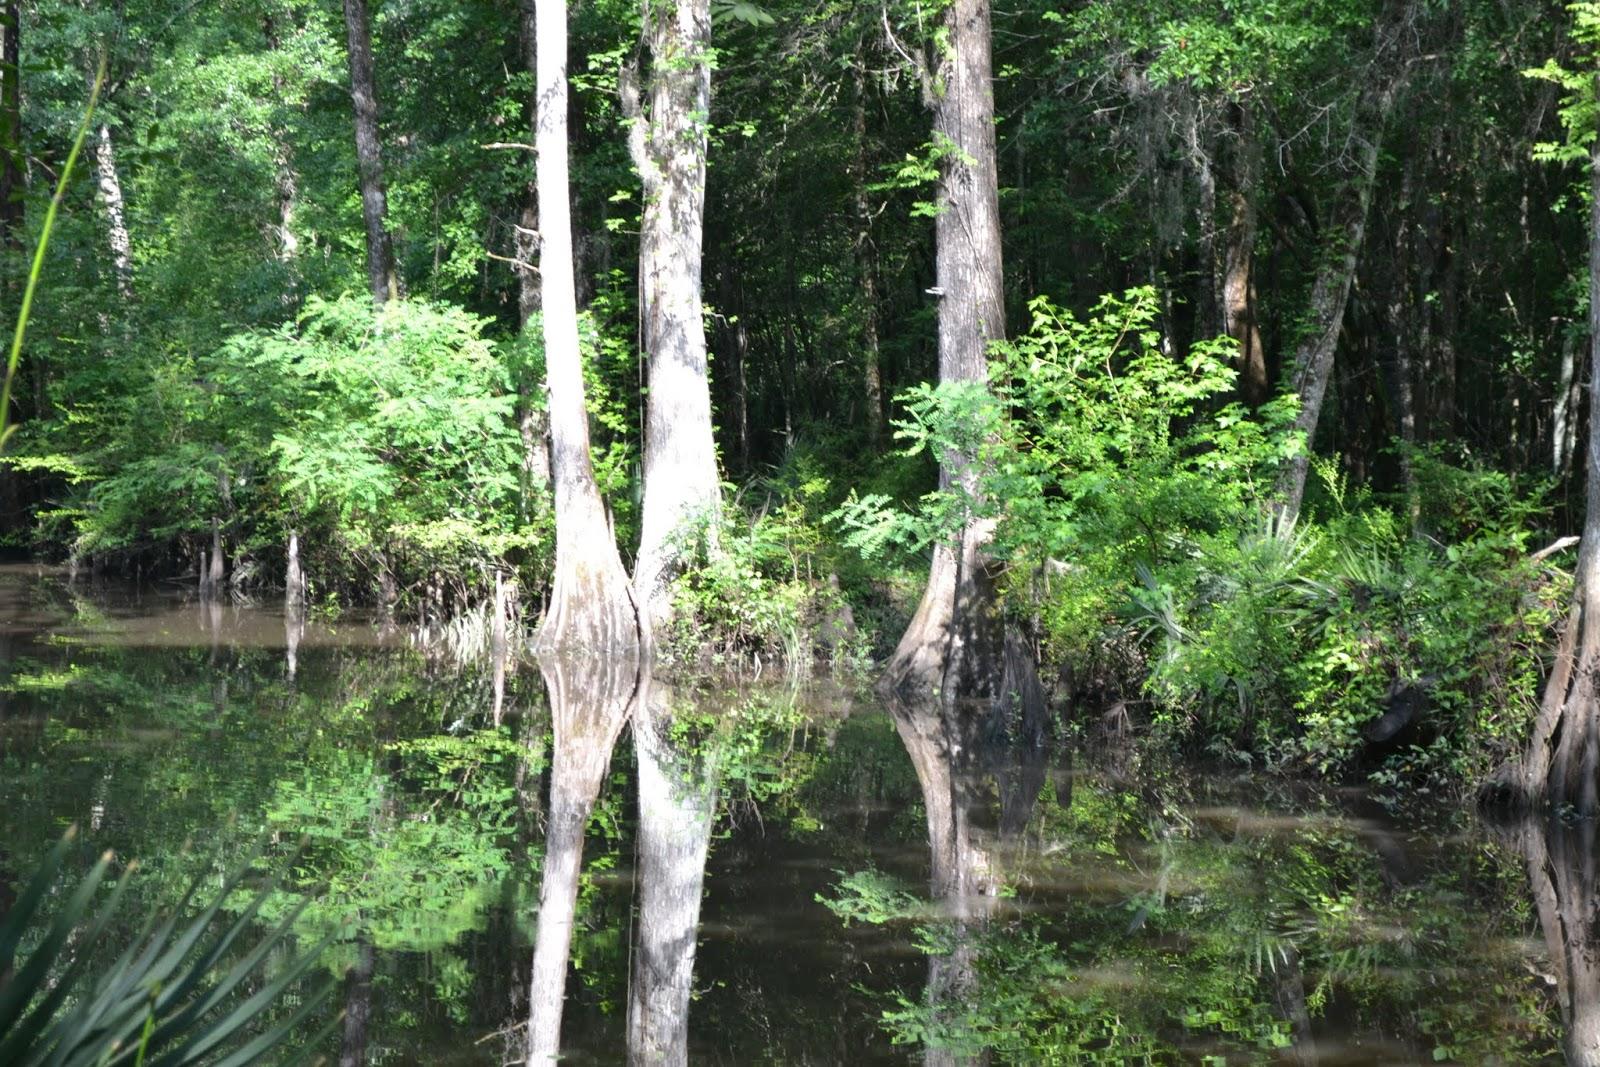 Исторический канал Саванна - Огичи (Historic Savannah-Ogeechee Barge Canal, Savannah, GA)